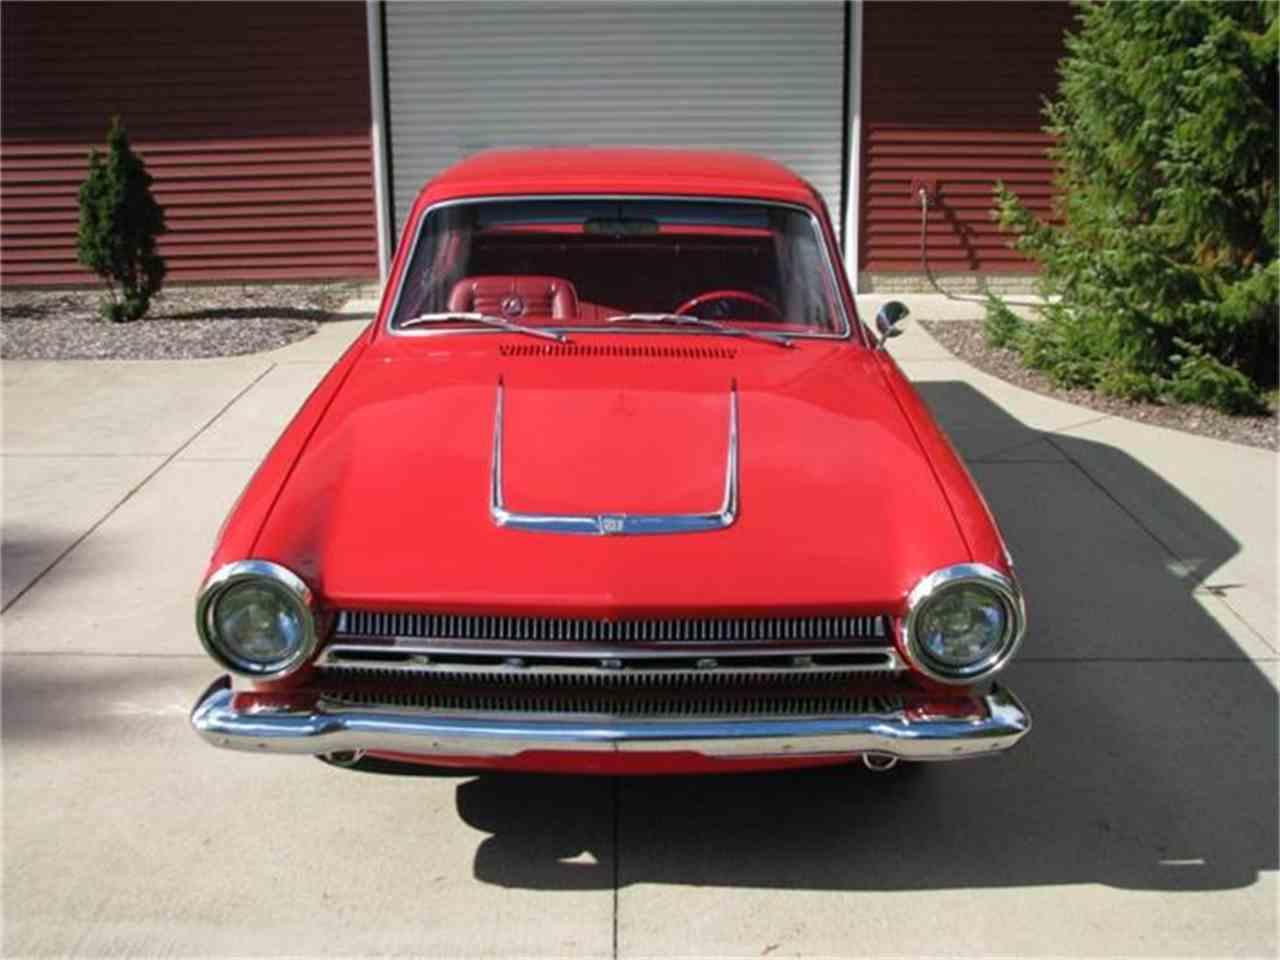 Classic Dodge Dart Gt 1964 Gts For Sale Classiccarscom Cc 733362